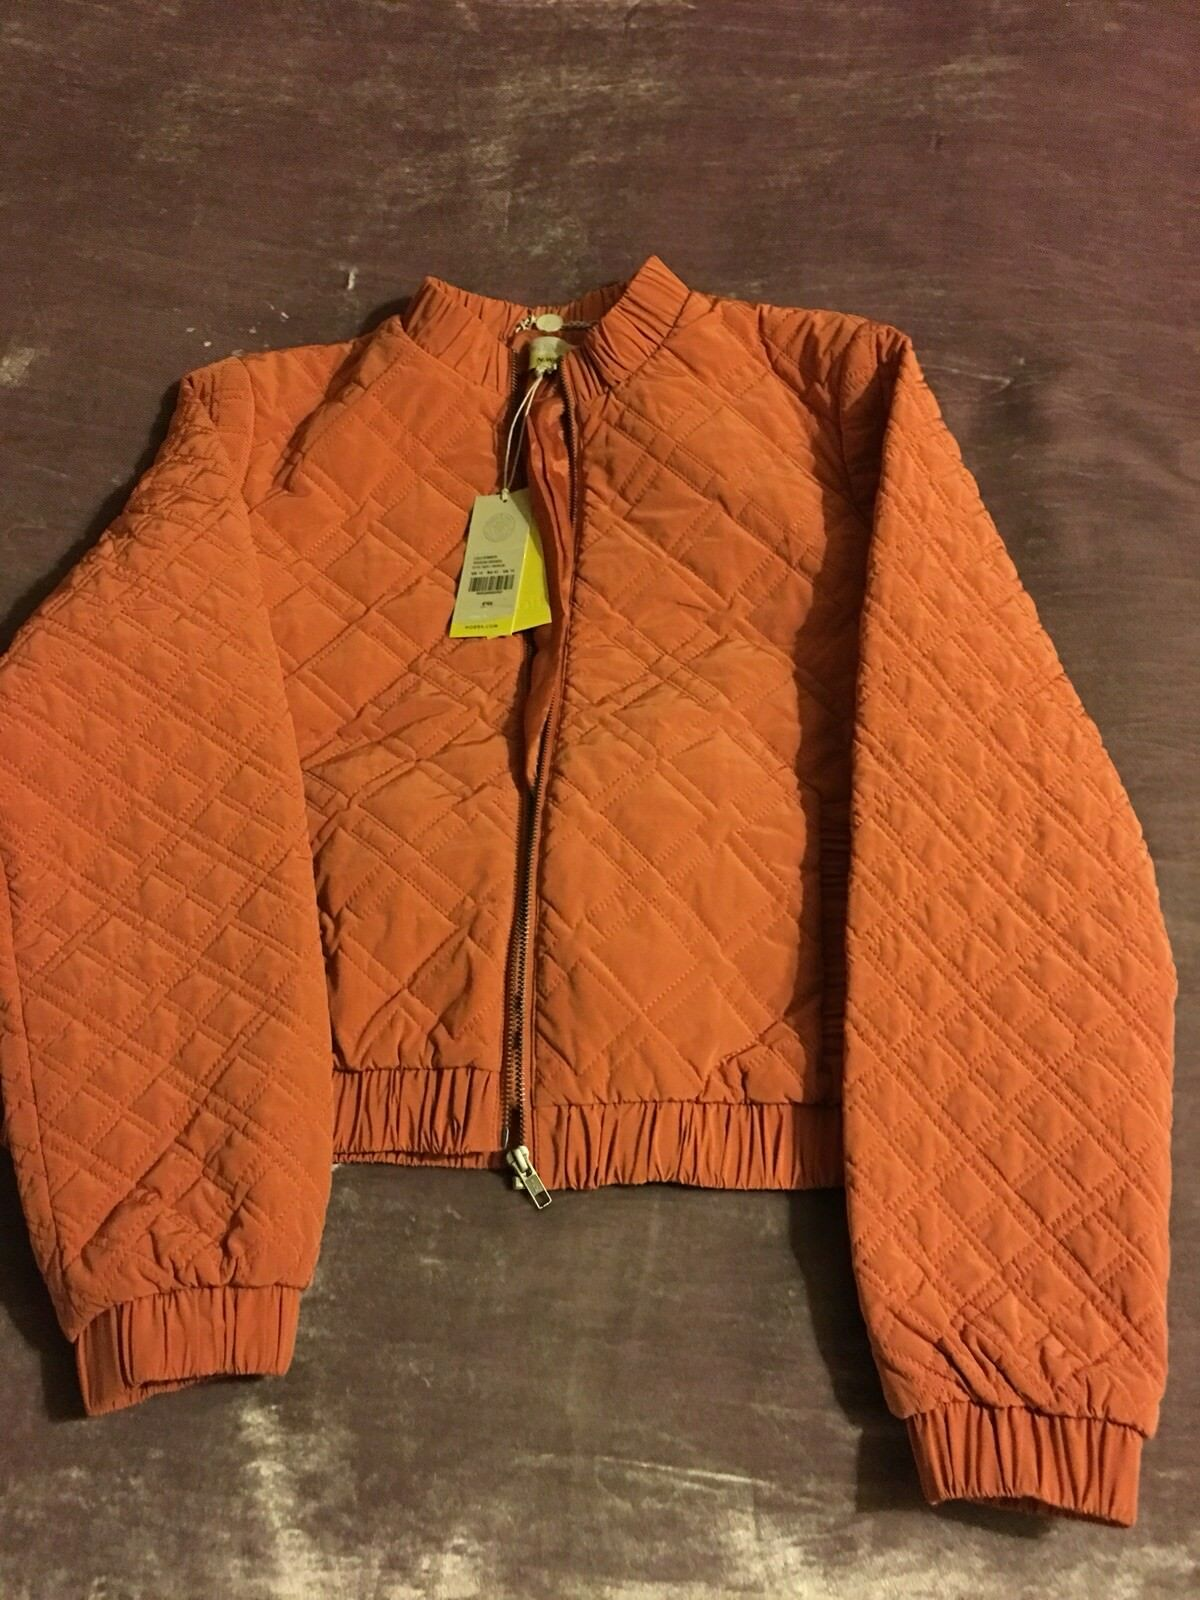 Hobbs Coat Lola Bomber,size  RRP 155.00